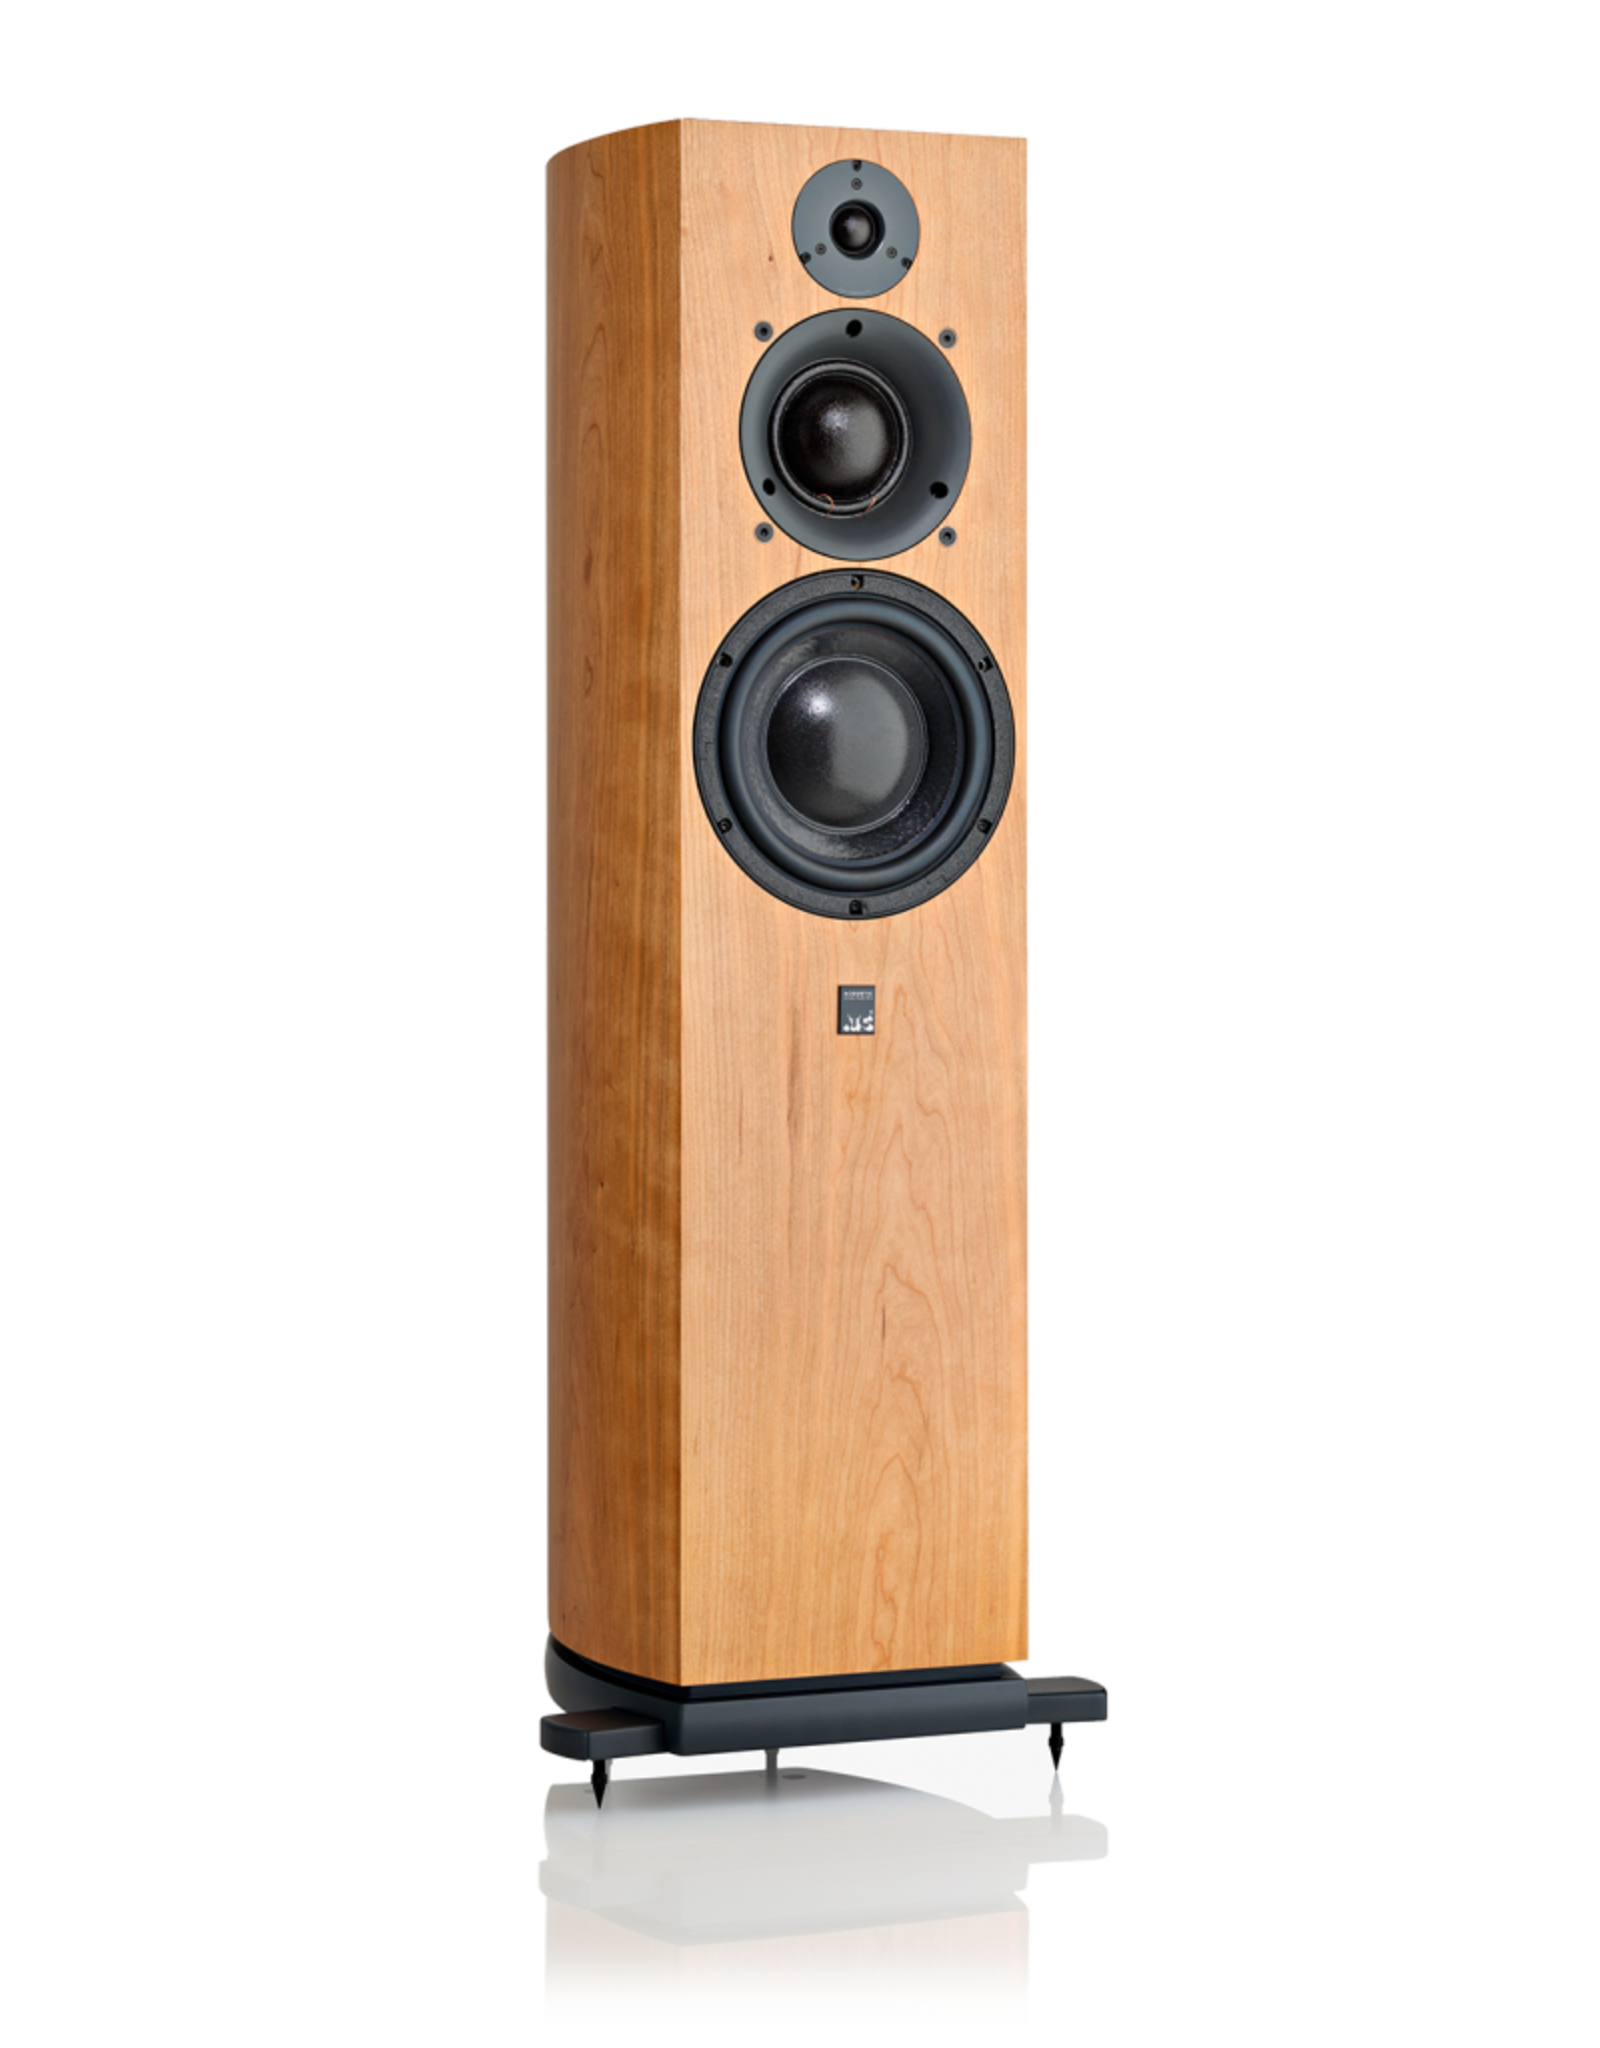 ATC ATC SCM40A Powered Floorstanding Loudspeakers Cherry EX-DEMO